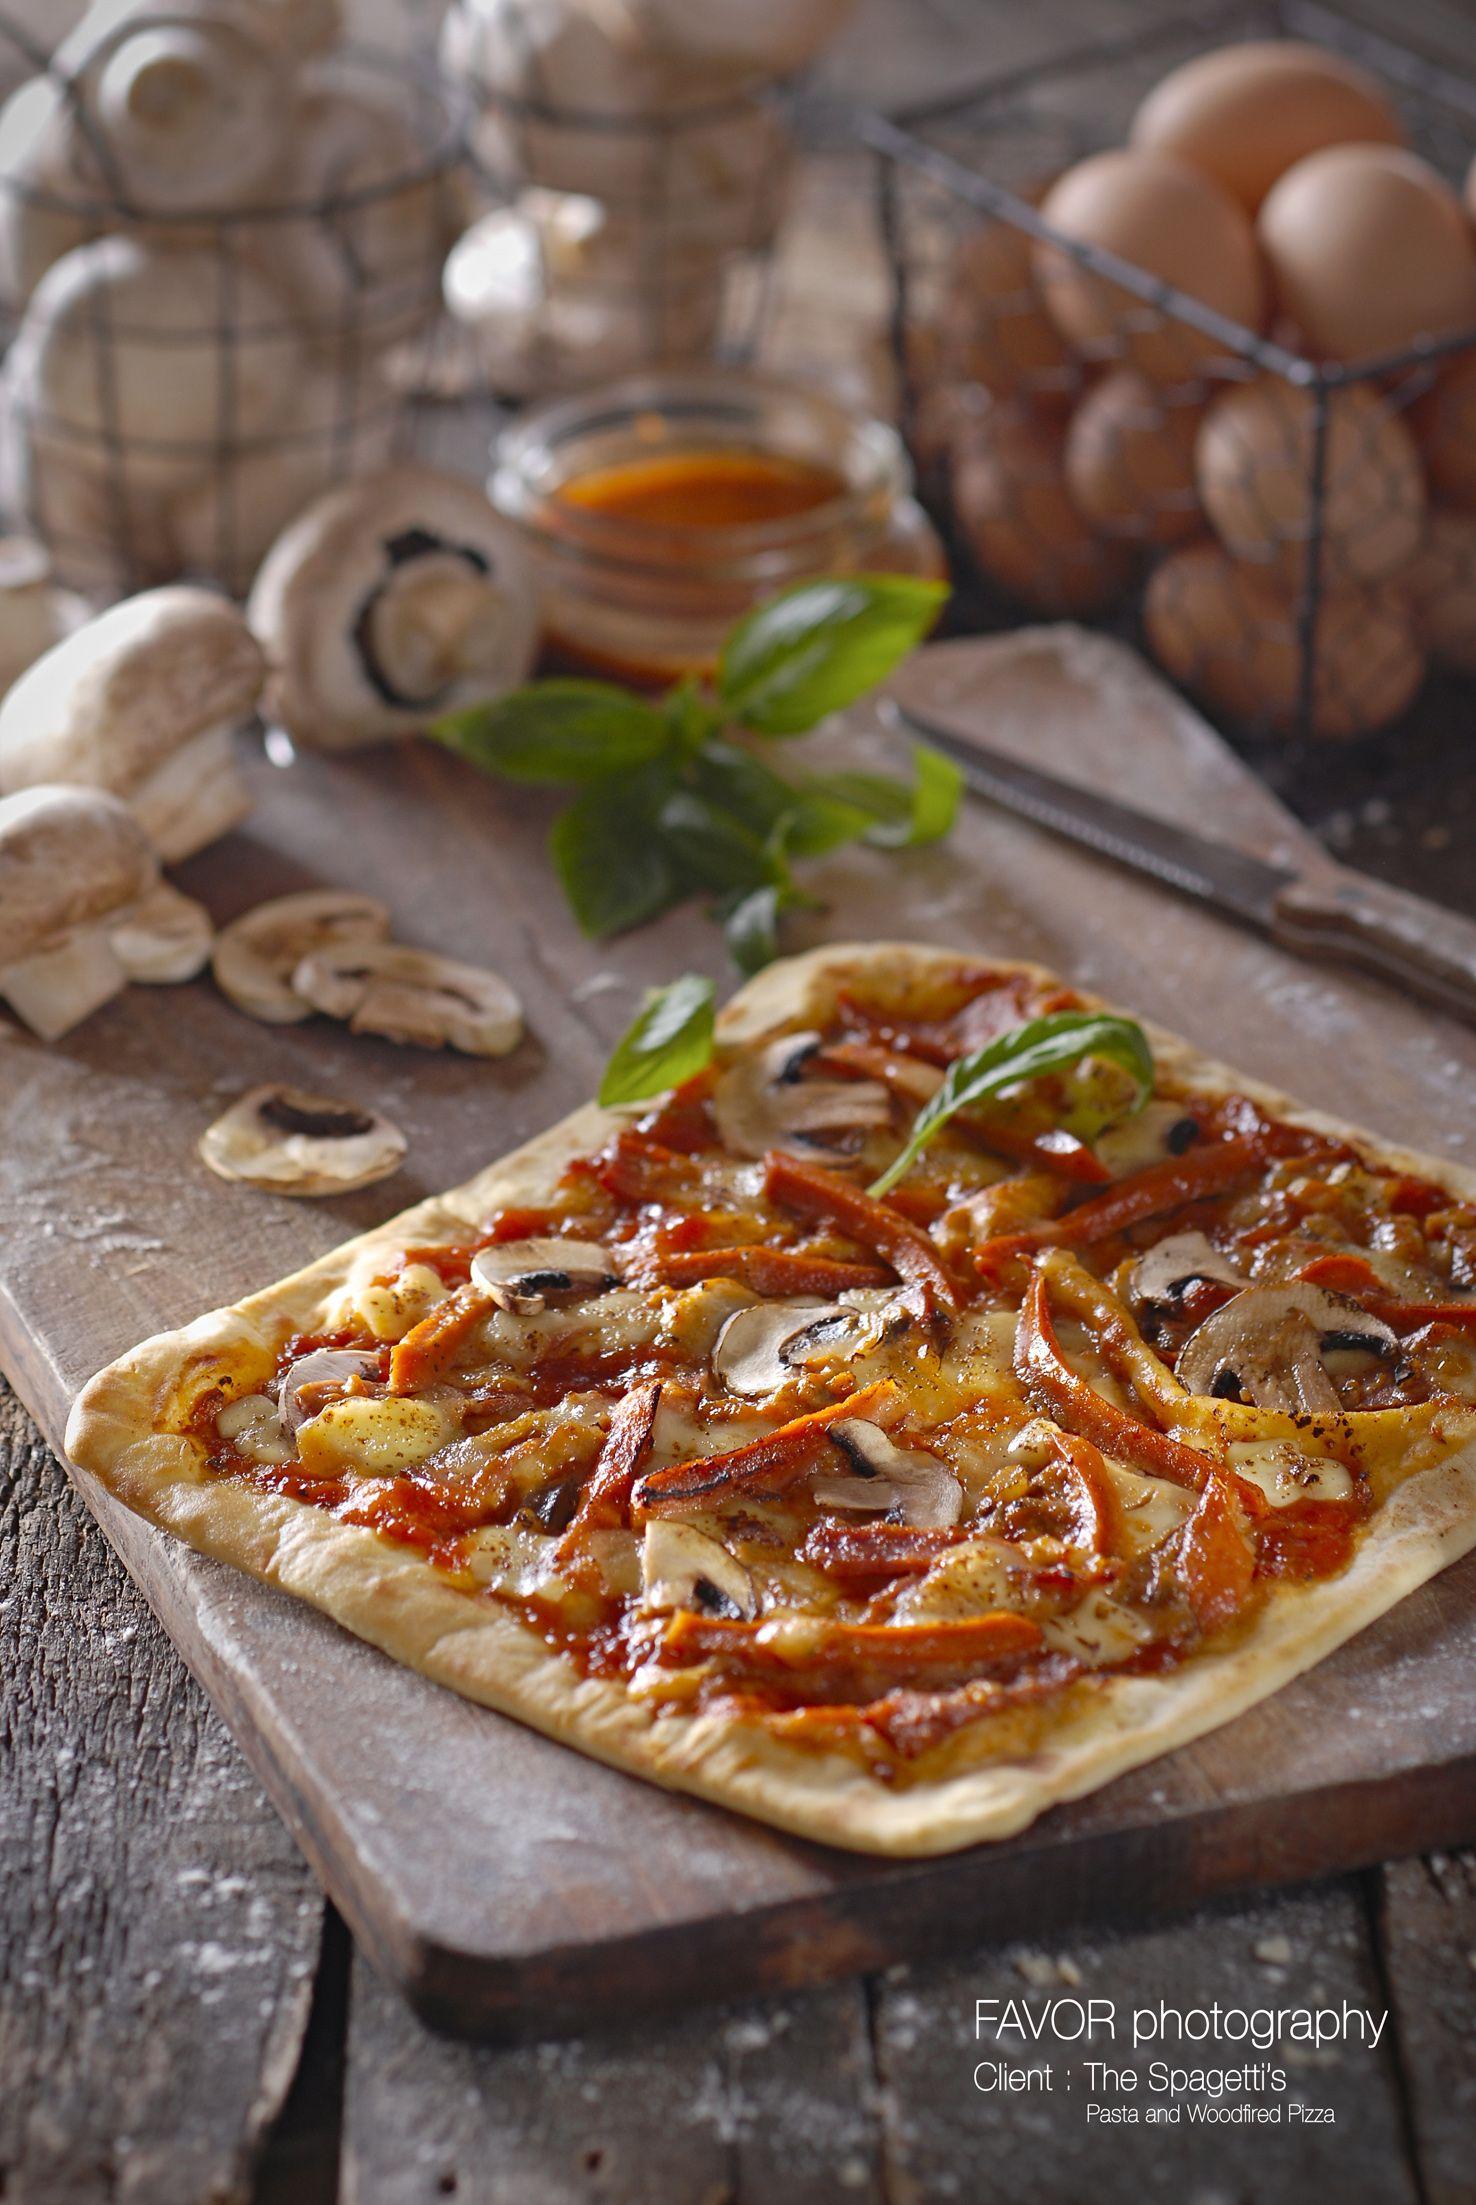 The Spagetti's pasta & woodfired pizza Surabaya, Indonesia